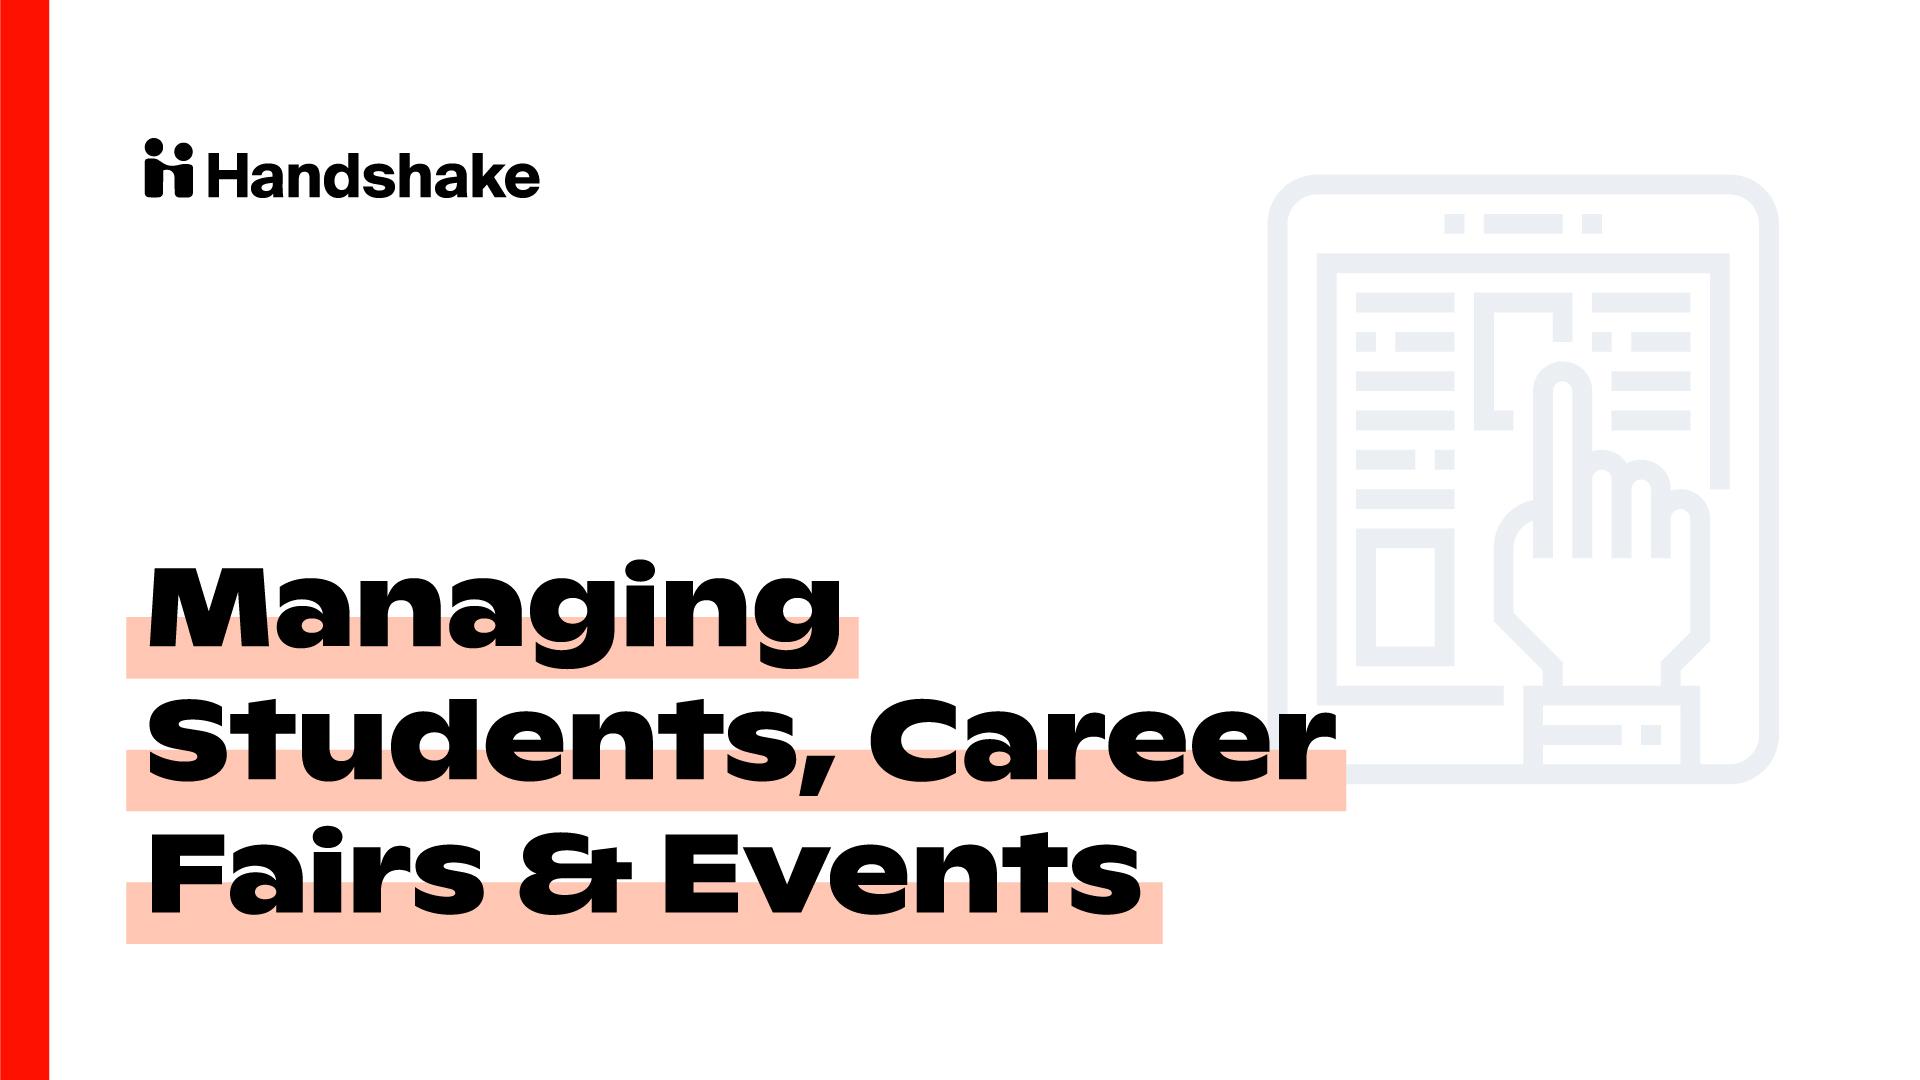 Milestone 5: Managing Students, Career Fairs & Events